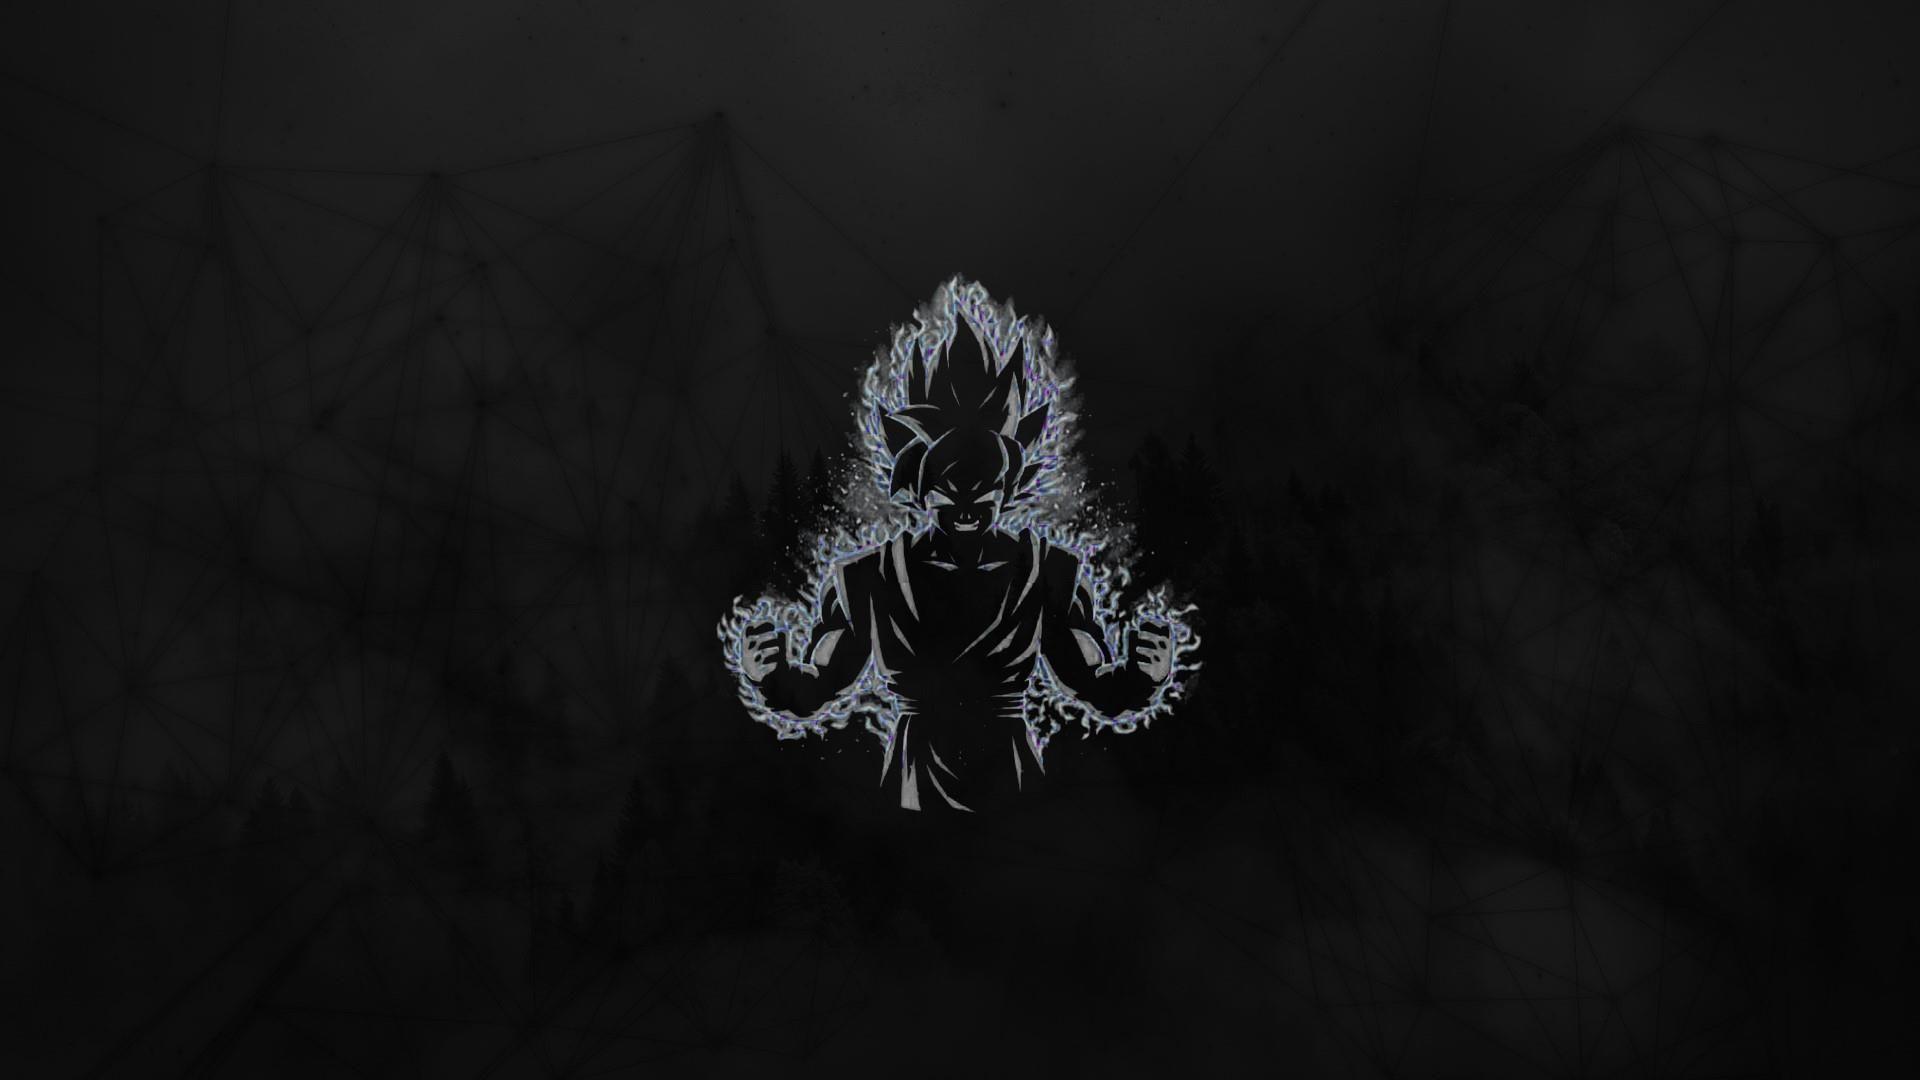 Goku Black And White Wallpapers Top Free Goku Black And White Backgrounds Wallpaperaccess